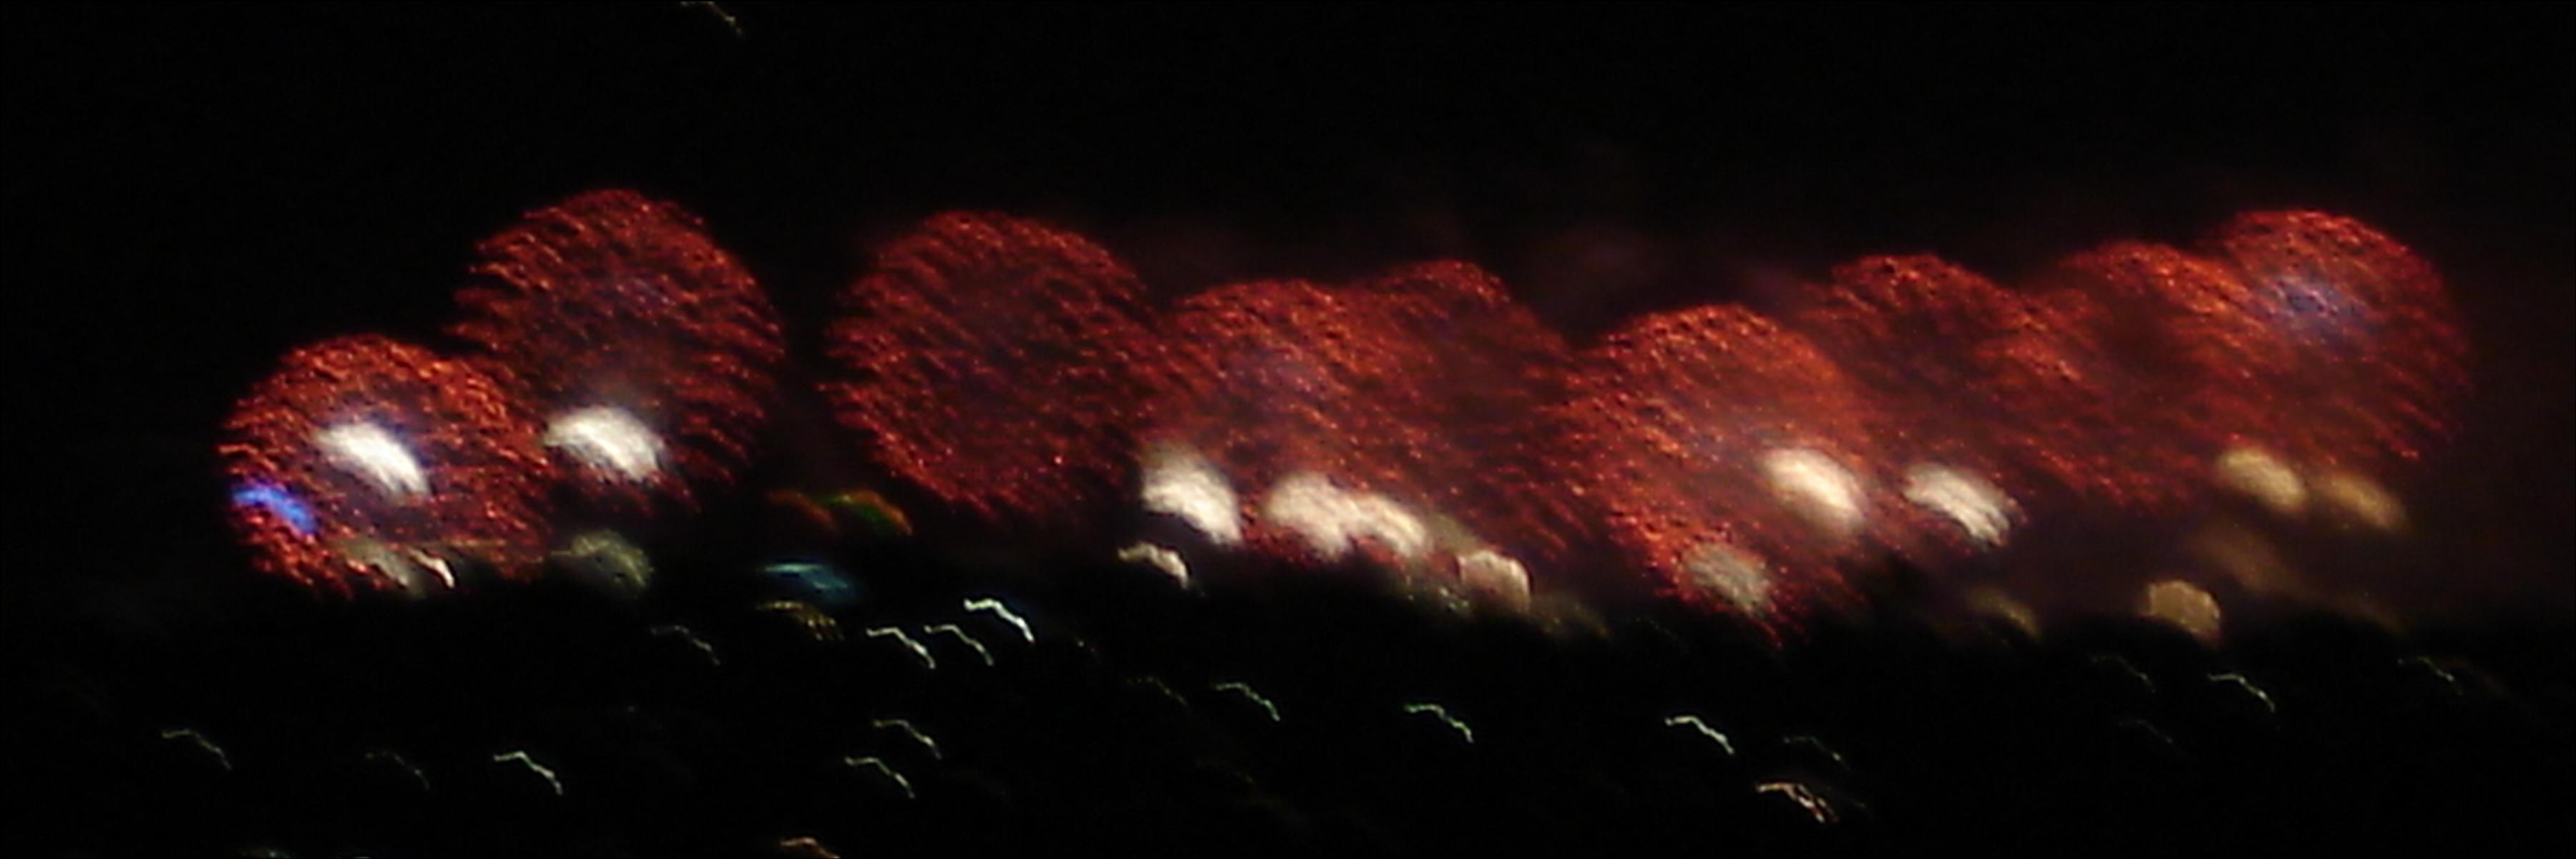 Fireworks1_2.jpg